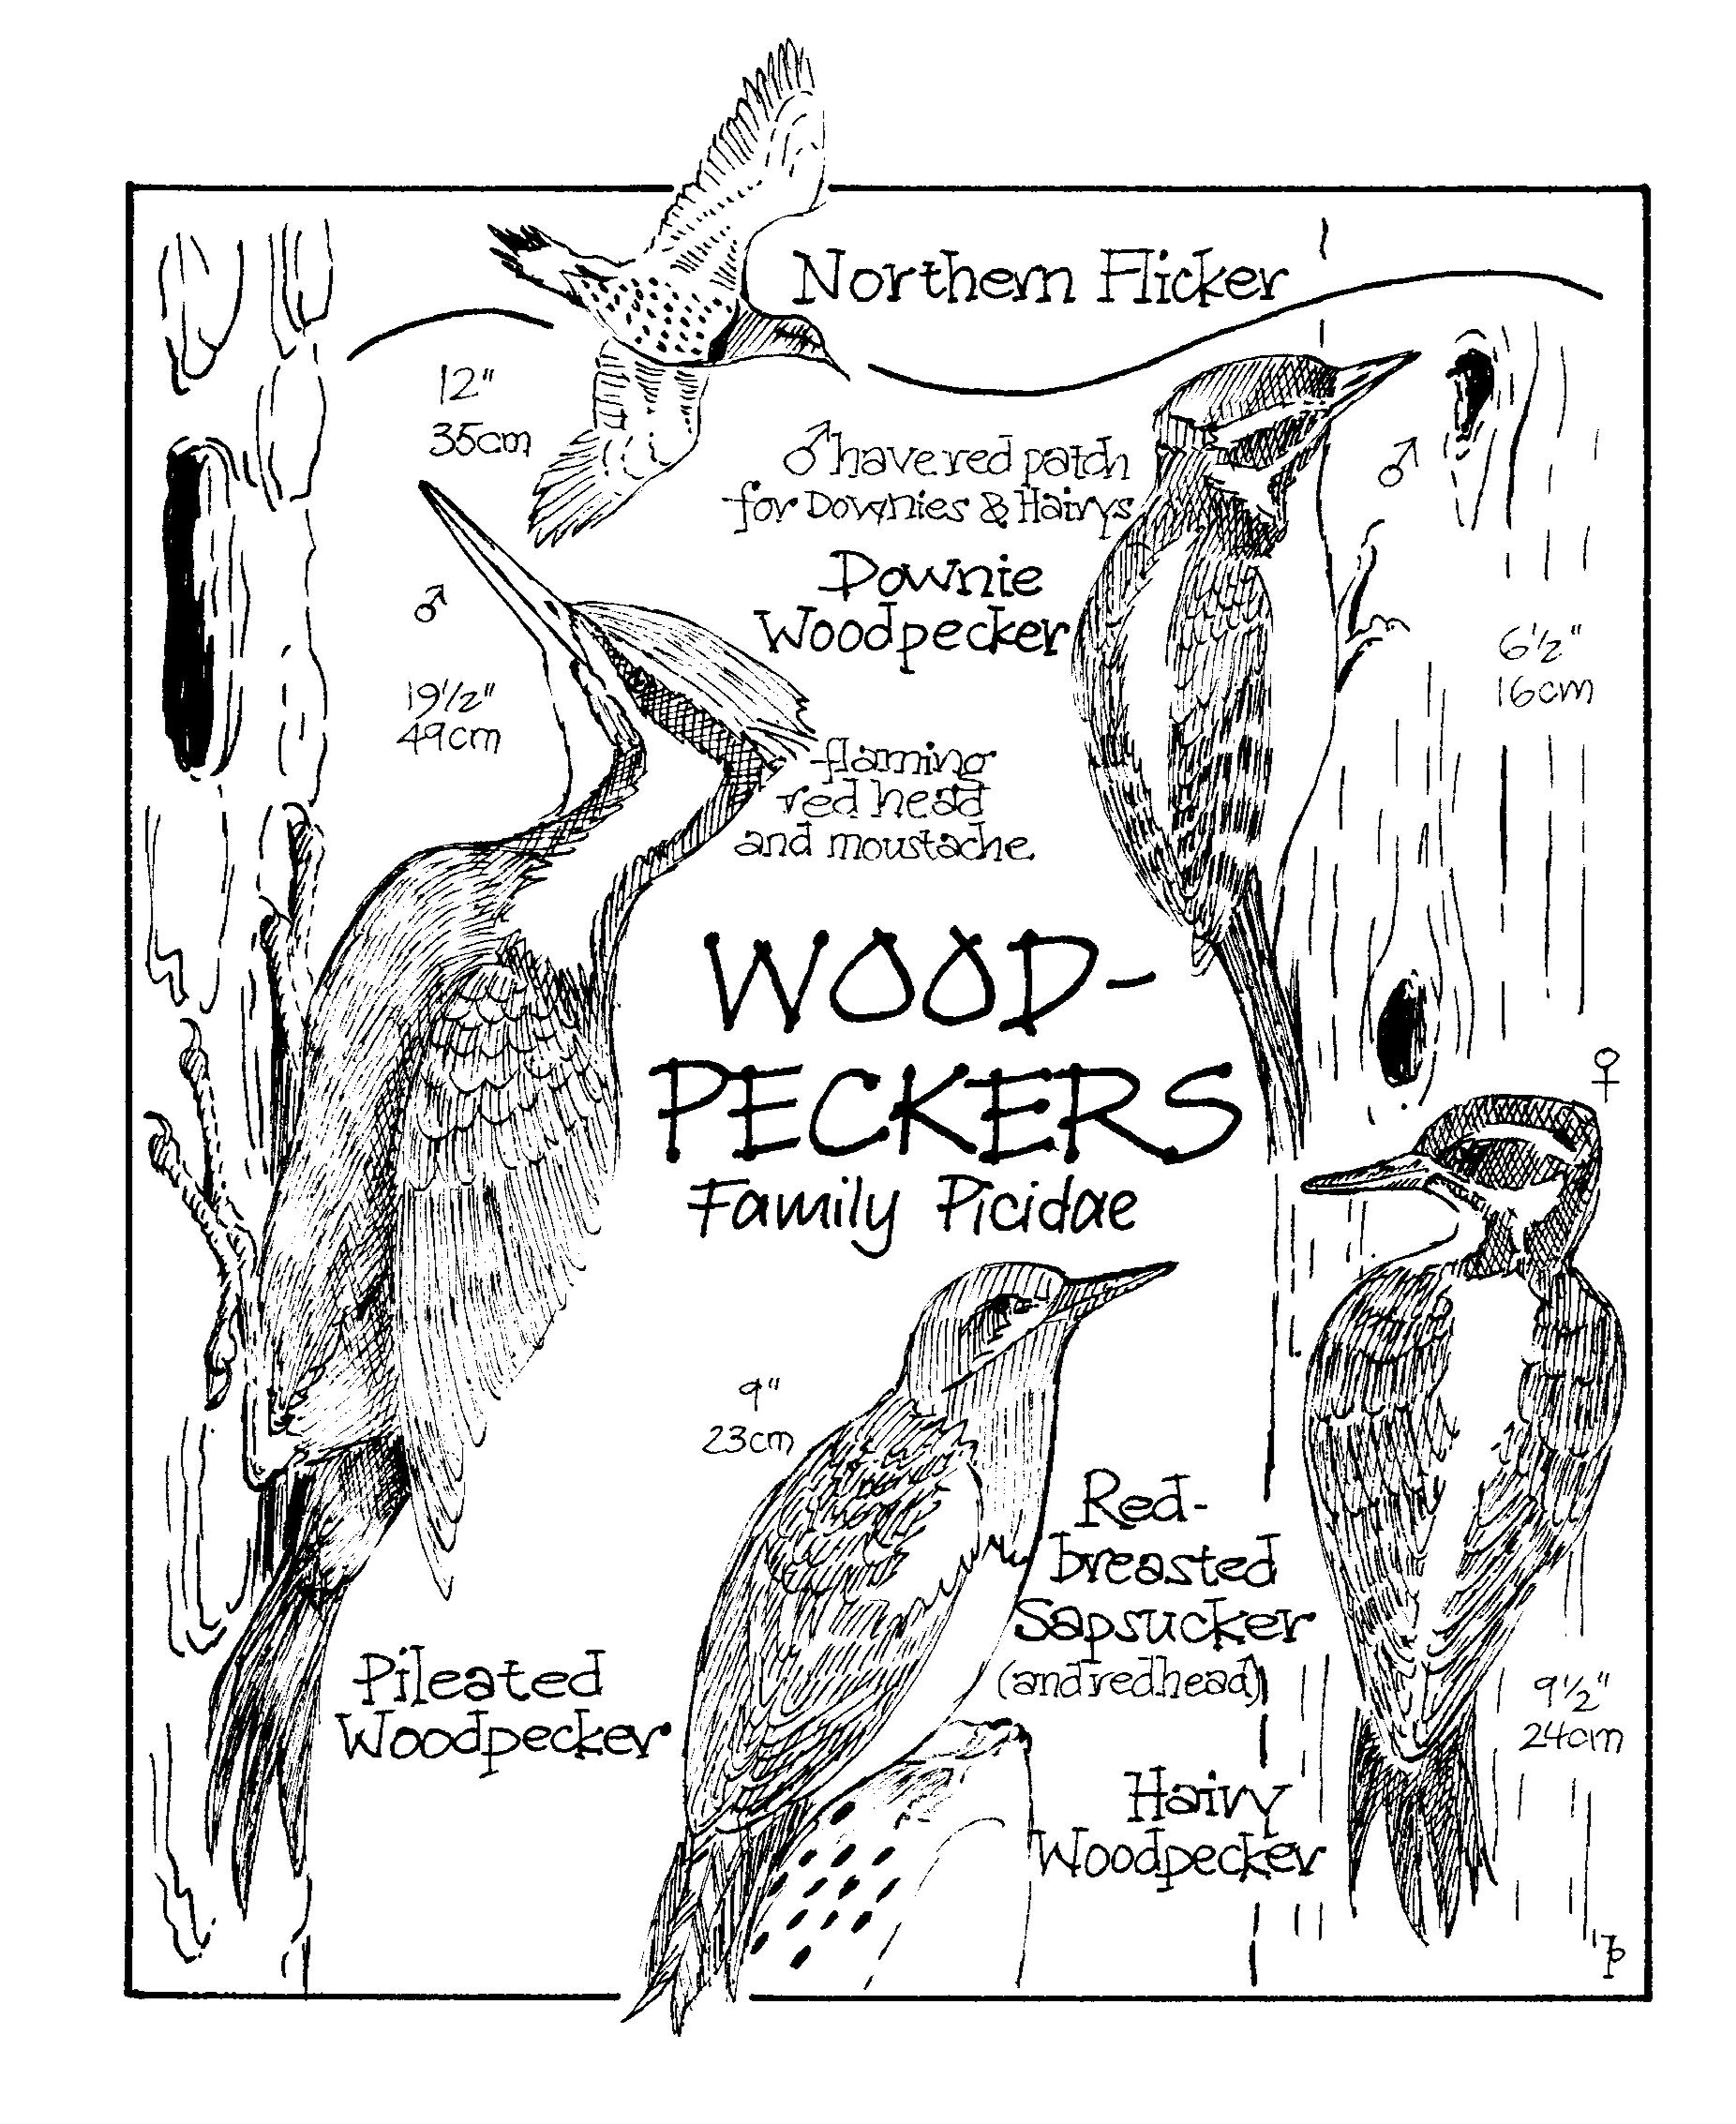 woodpecker copy.png